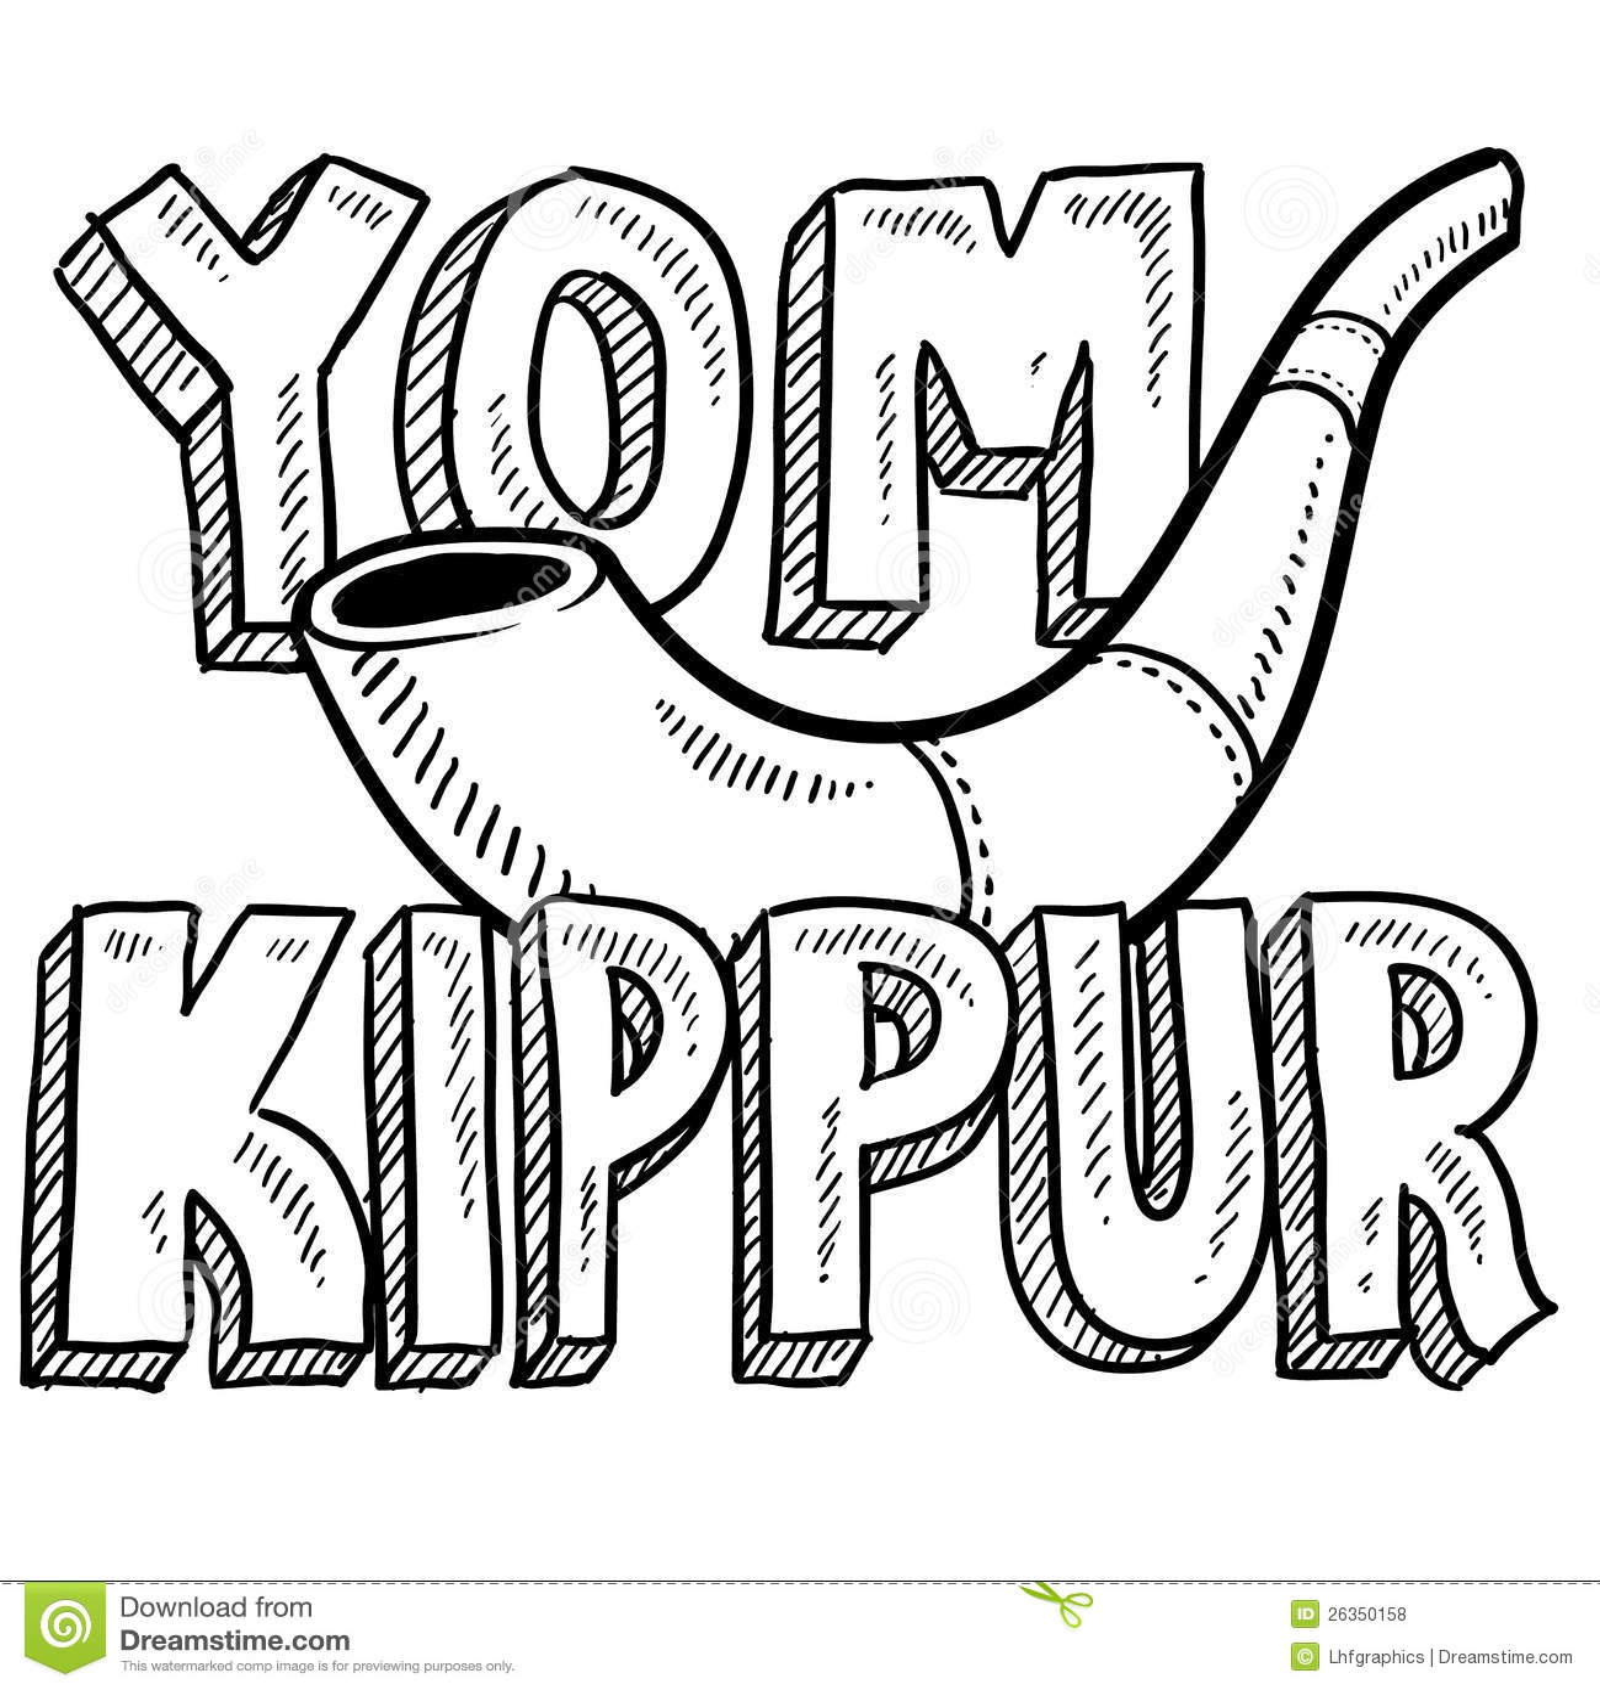 Yom Kippur Jewish Holiday Sketch Royalty Free Stock Photos